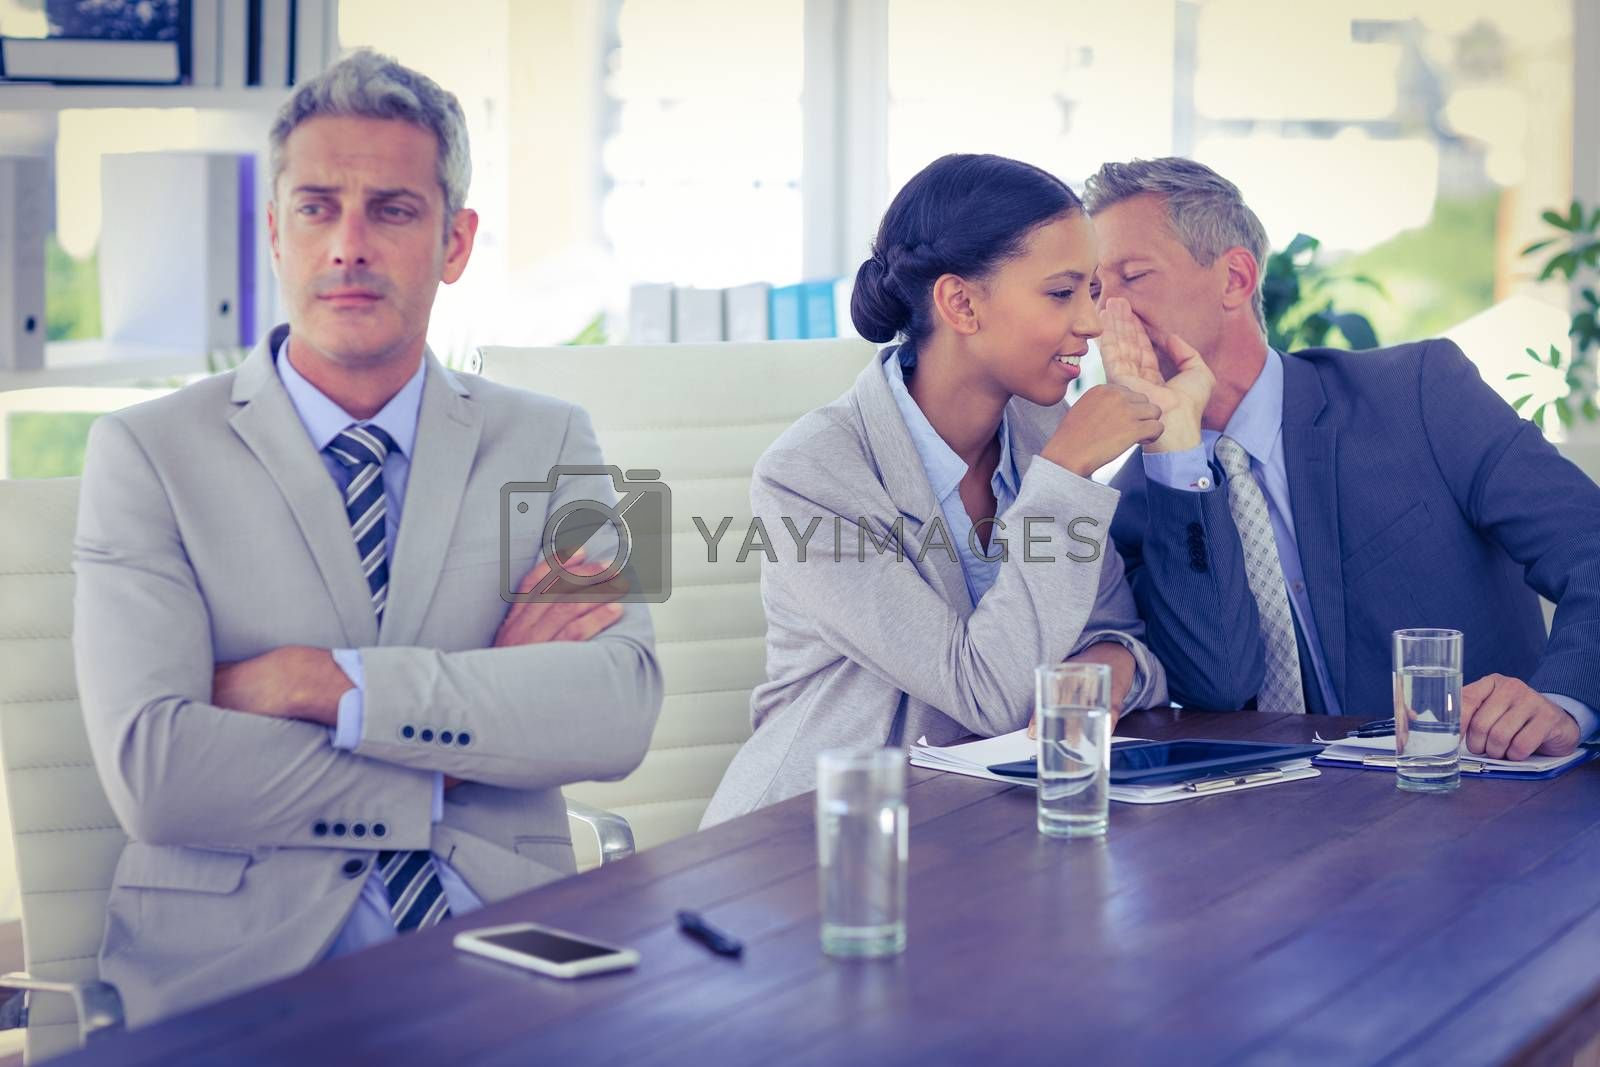 Royalty free image of Sad businessman looking aways while his colleagues speaks   by Wavebreakmedia